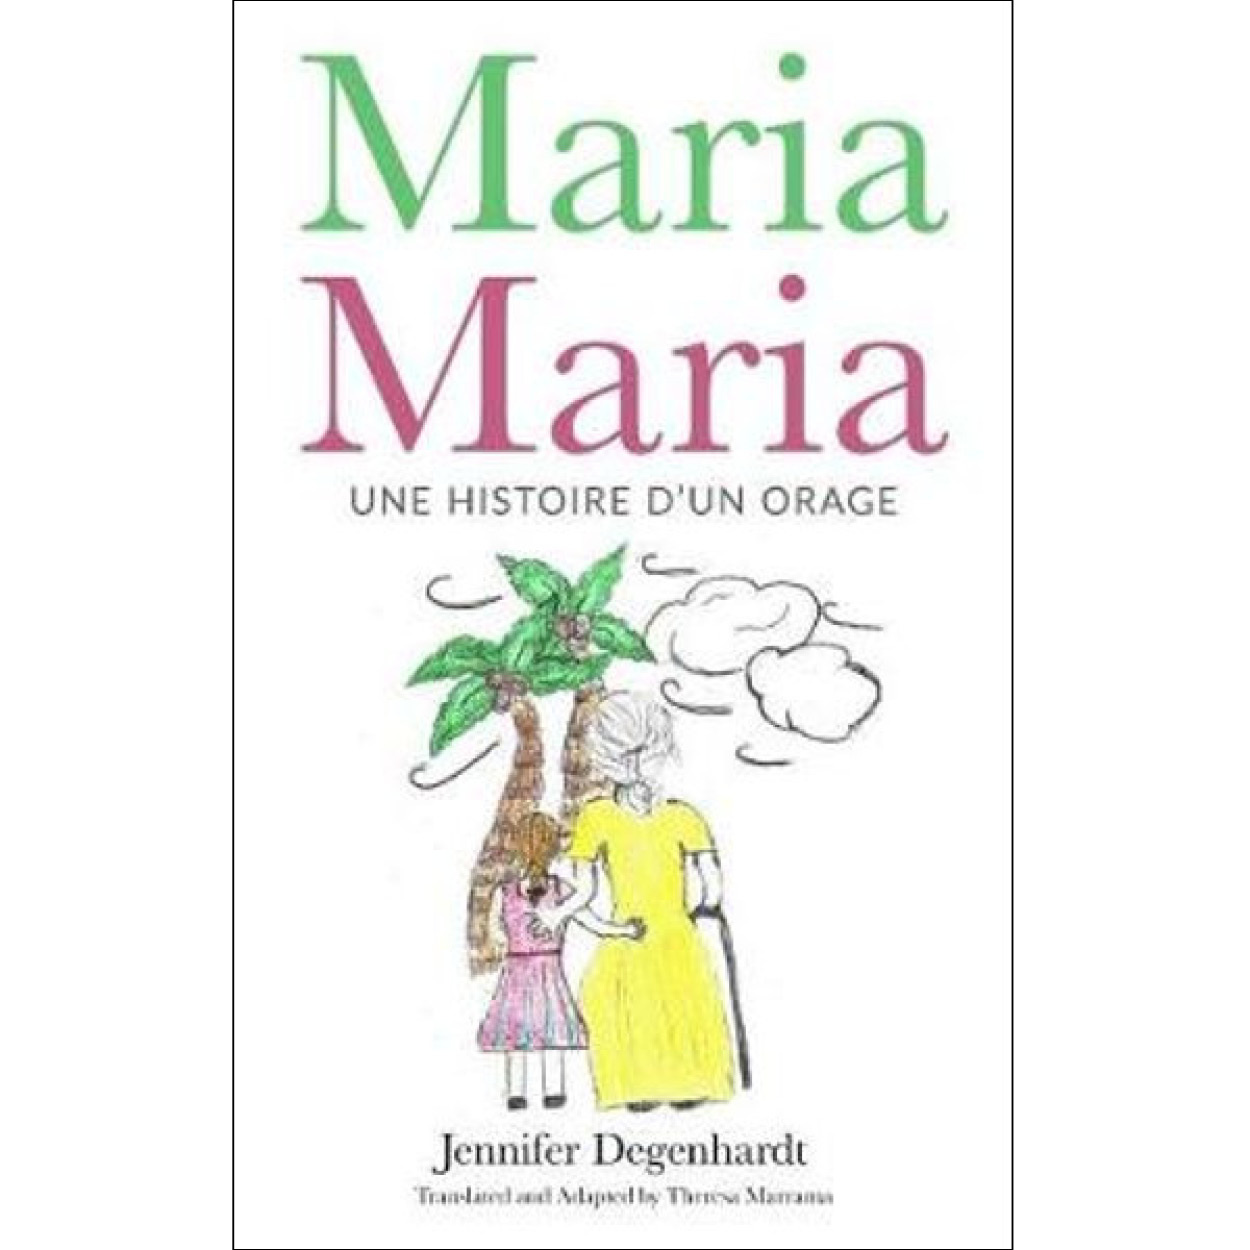 Maria Maria - Une histoire d'une orage